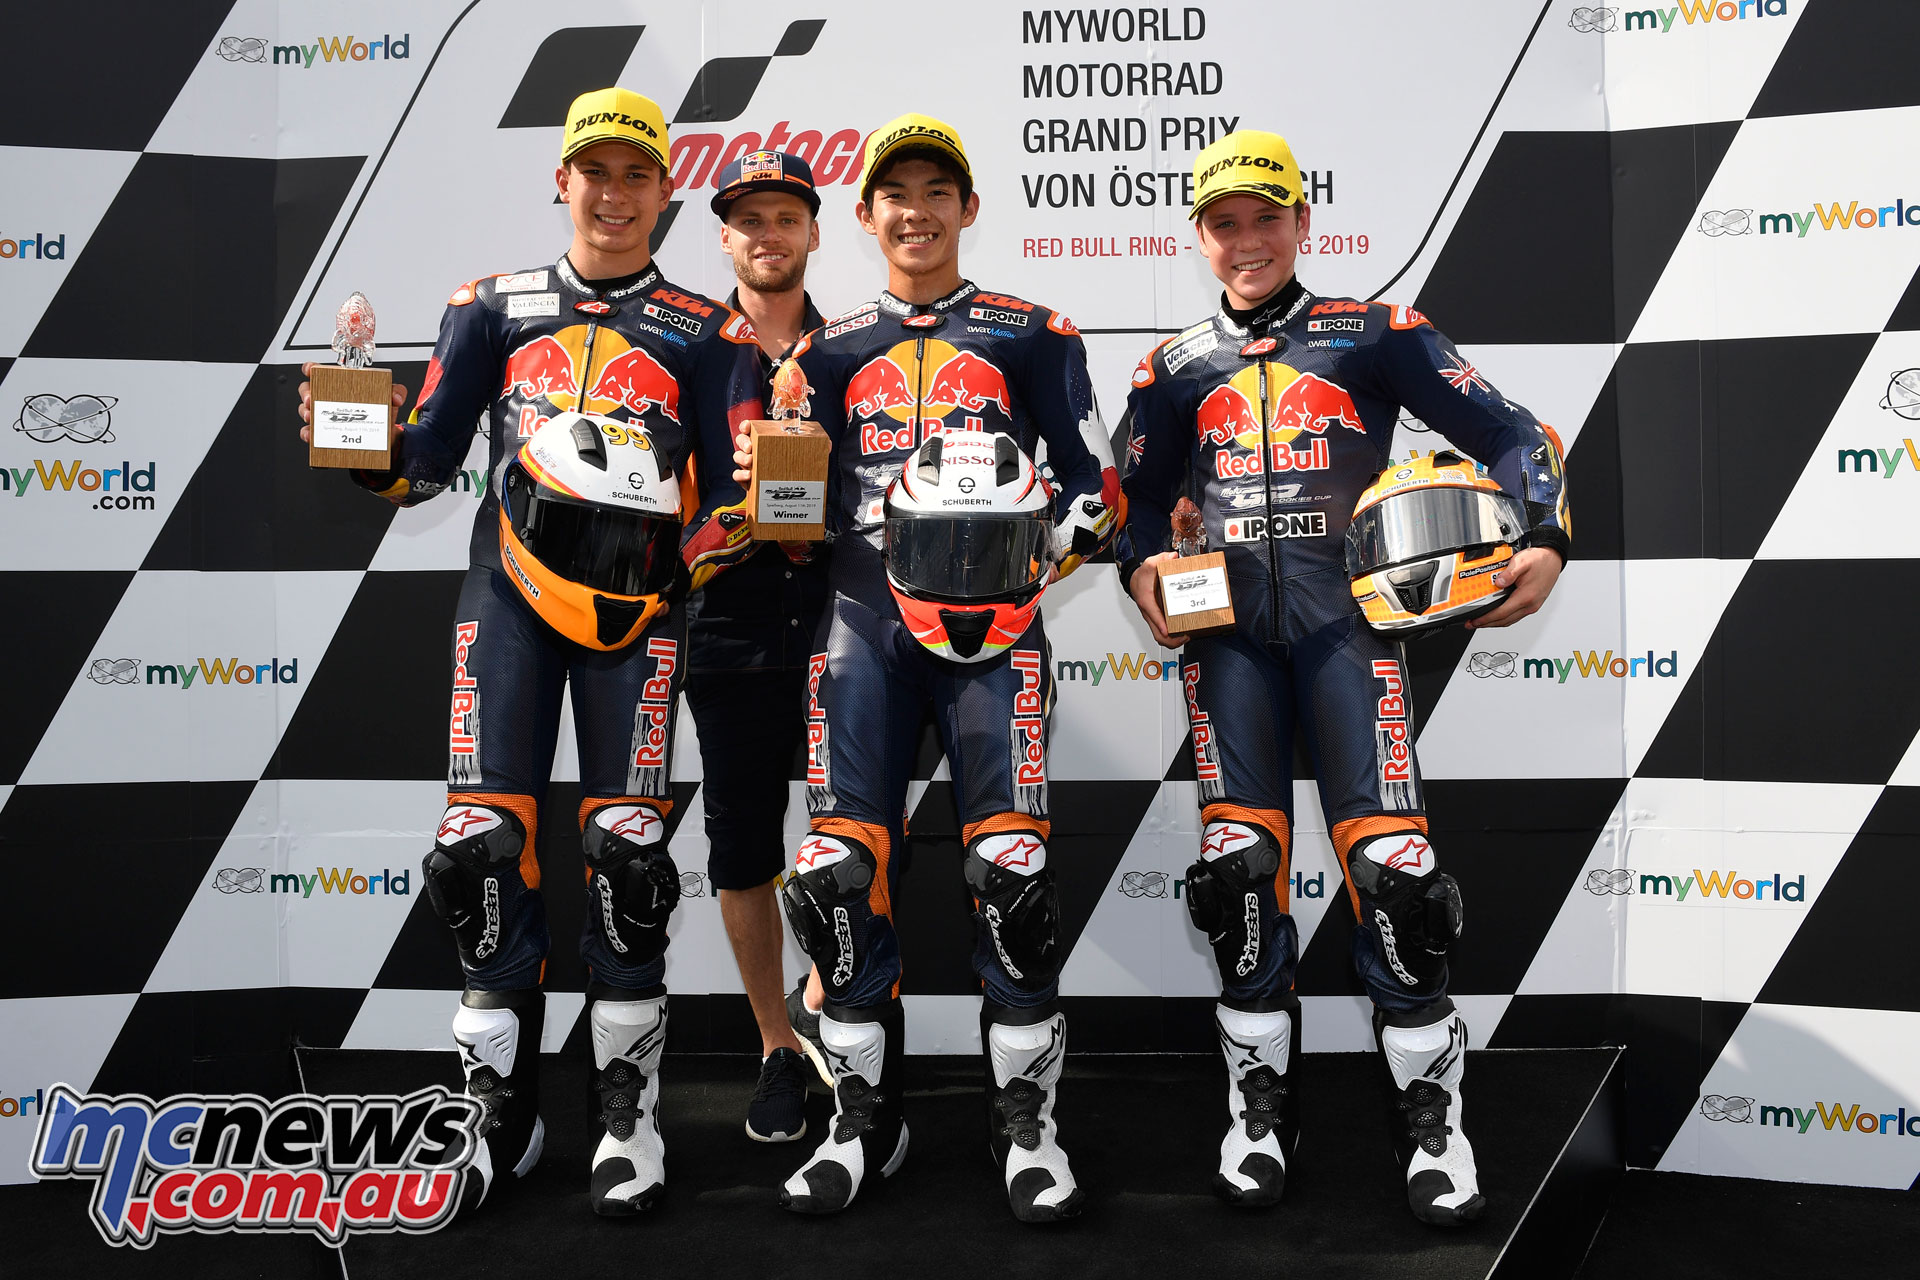 Red Bull Rookies Cup Rnd Austria Sun Race Podium